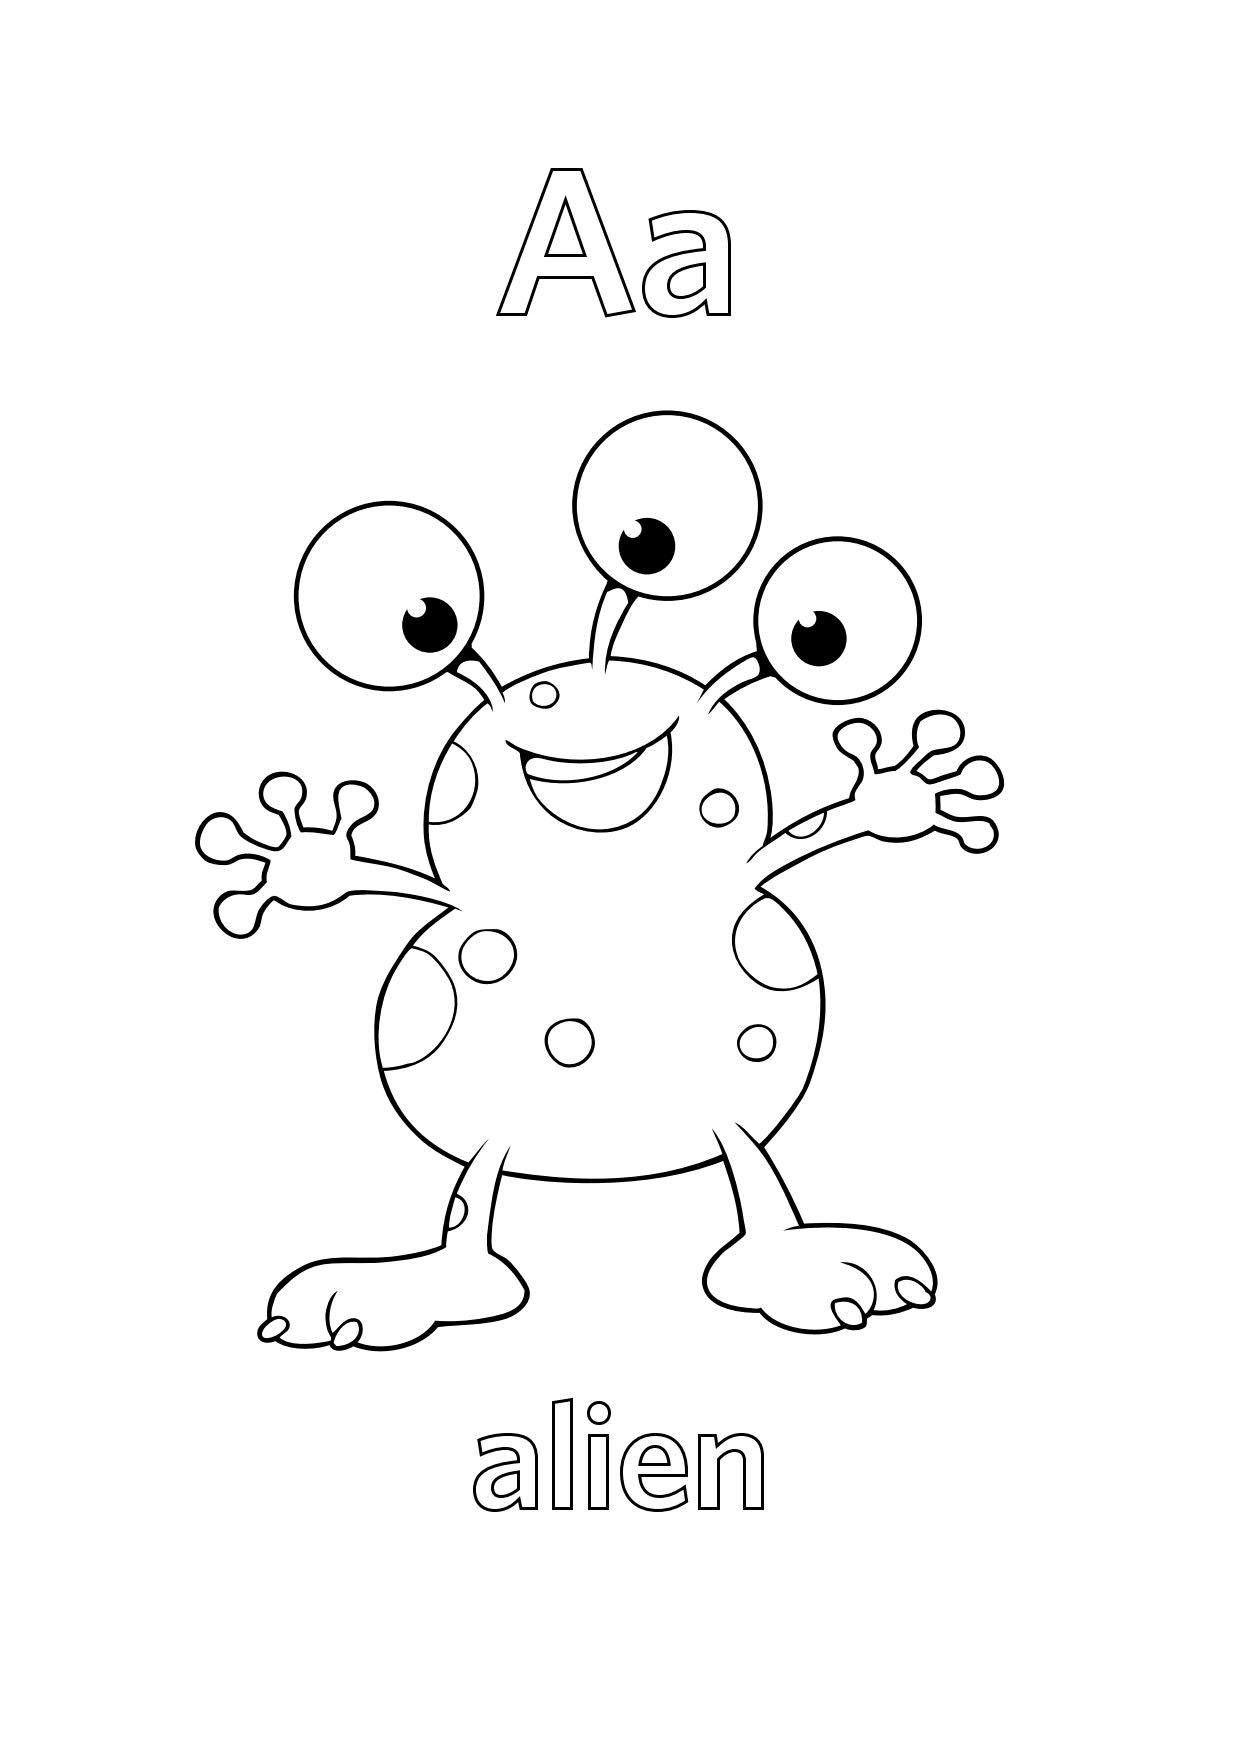 5 Coloring Worksheets Letter P In 2020 Alphabet Coloring Pages Letter A Coloring Pages Coloring Books